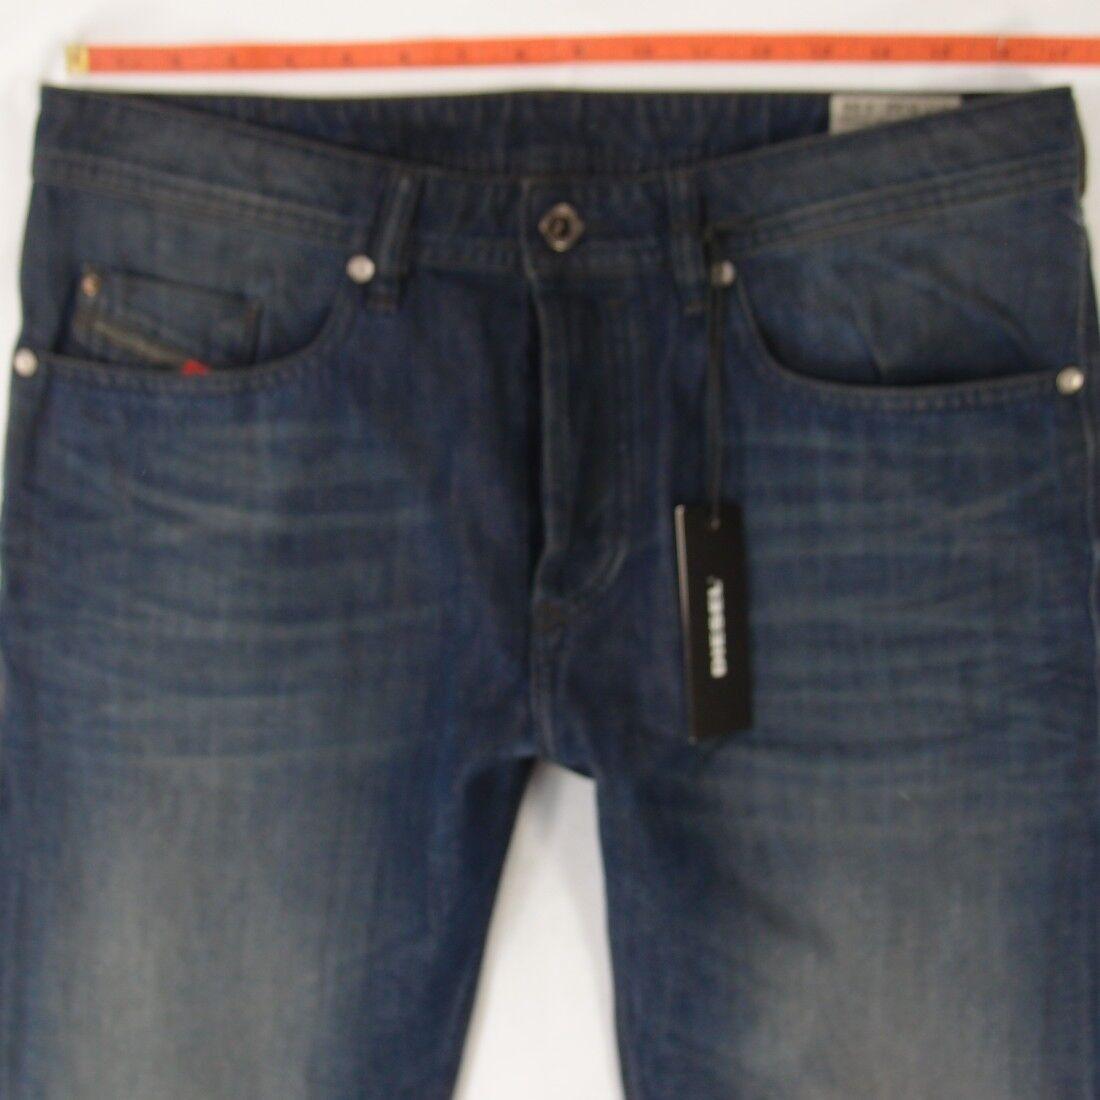 NEW Mens Diesel BUSTER 0849B Stretch Slim-Tapered bluee Jeans W33 W32 L34 BNWT